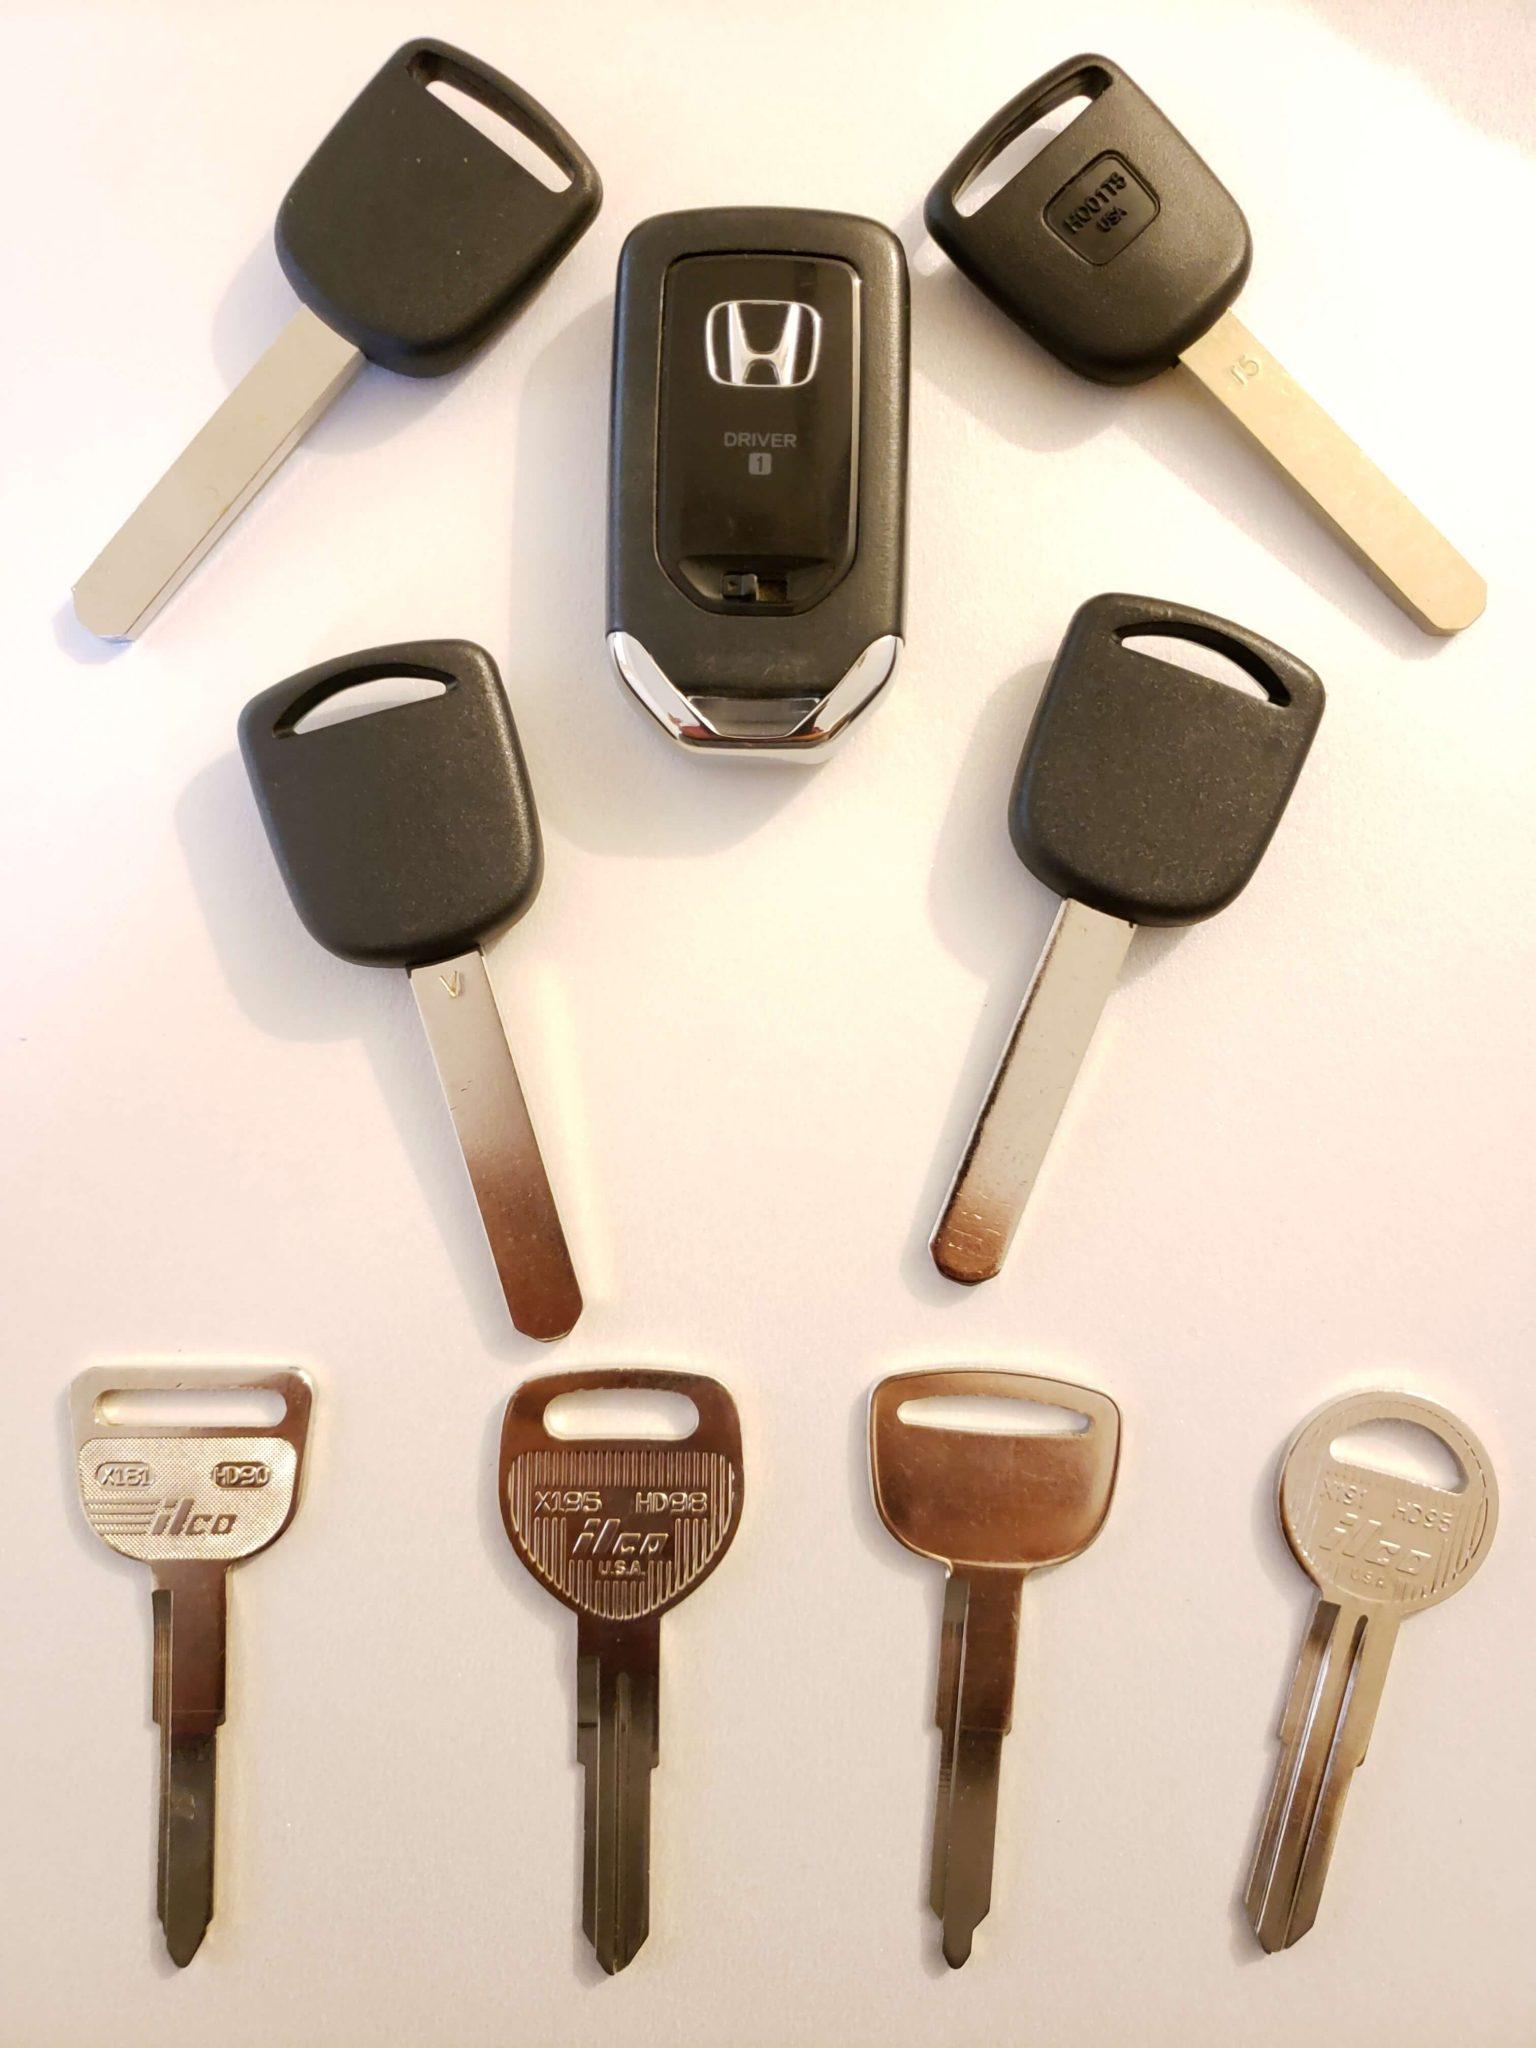 2009 Cadillac Escalade 5 Button Remote Start Keyless Entry Fob 09 Sp